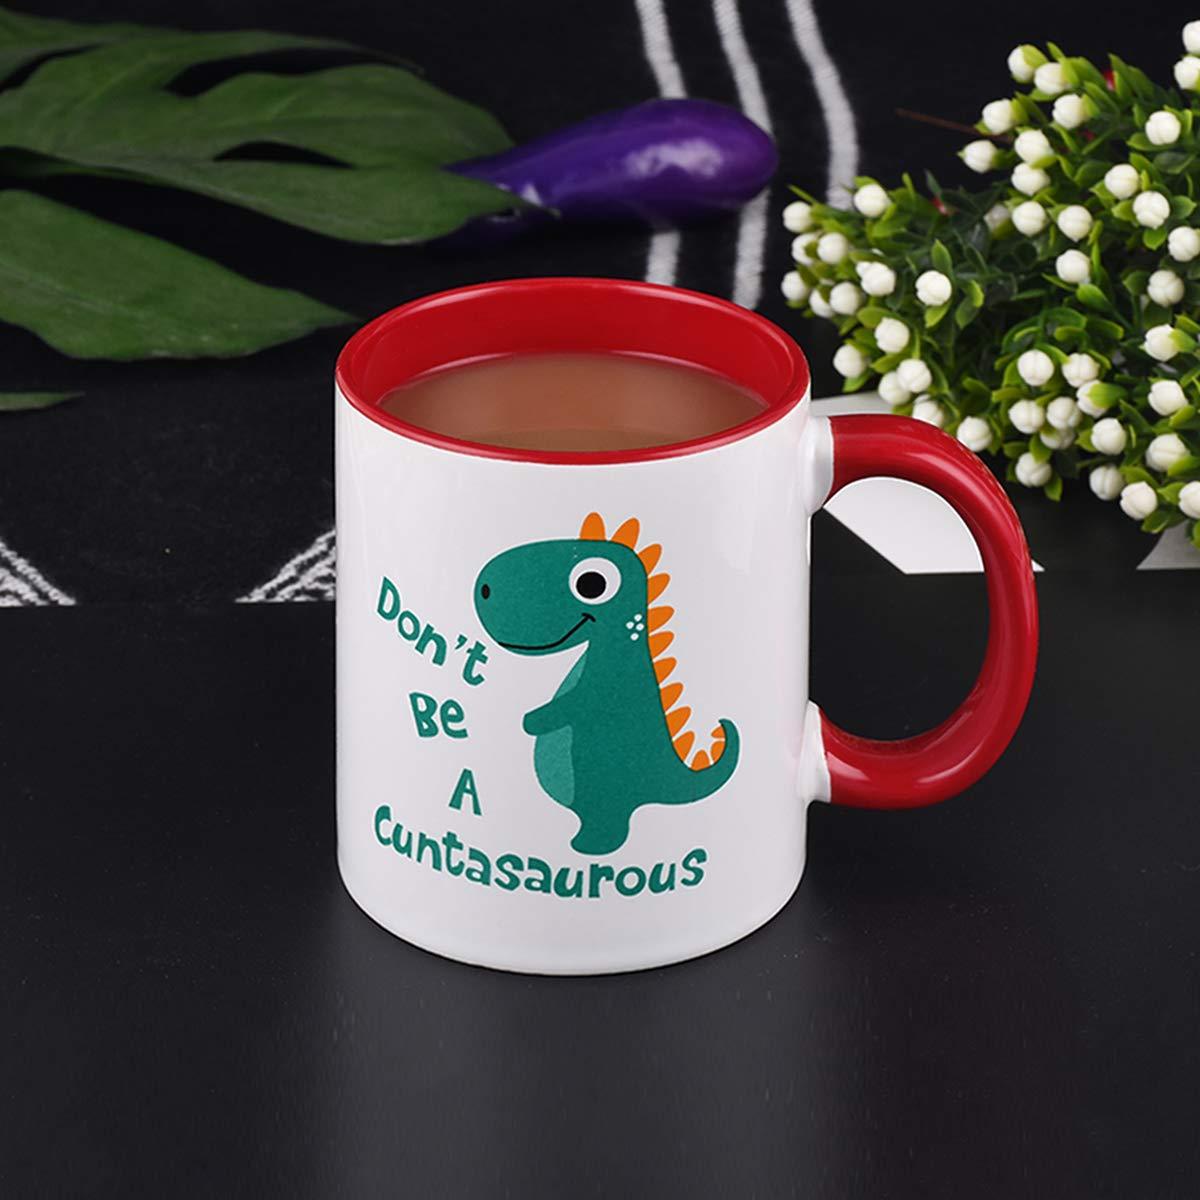 Funny Coffee Mug Gold electroplated Coffee Mug Novelty Coffee Mug Cup Funny Mug for Men Women